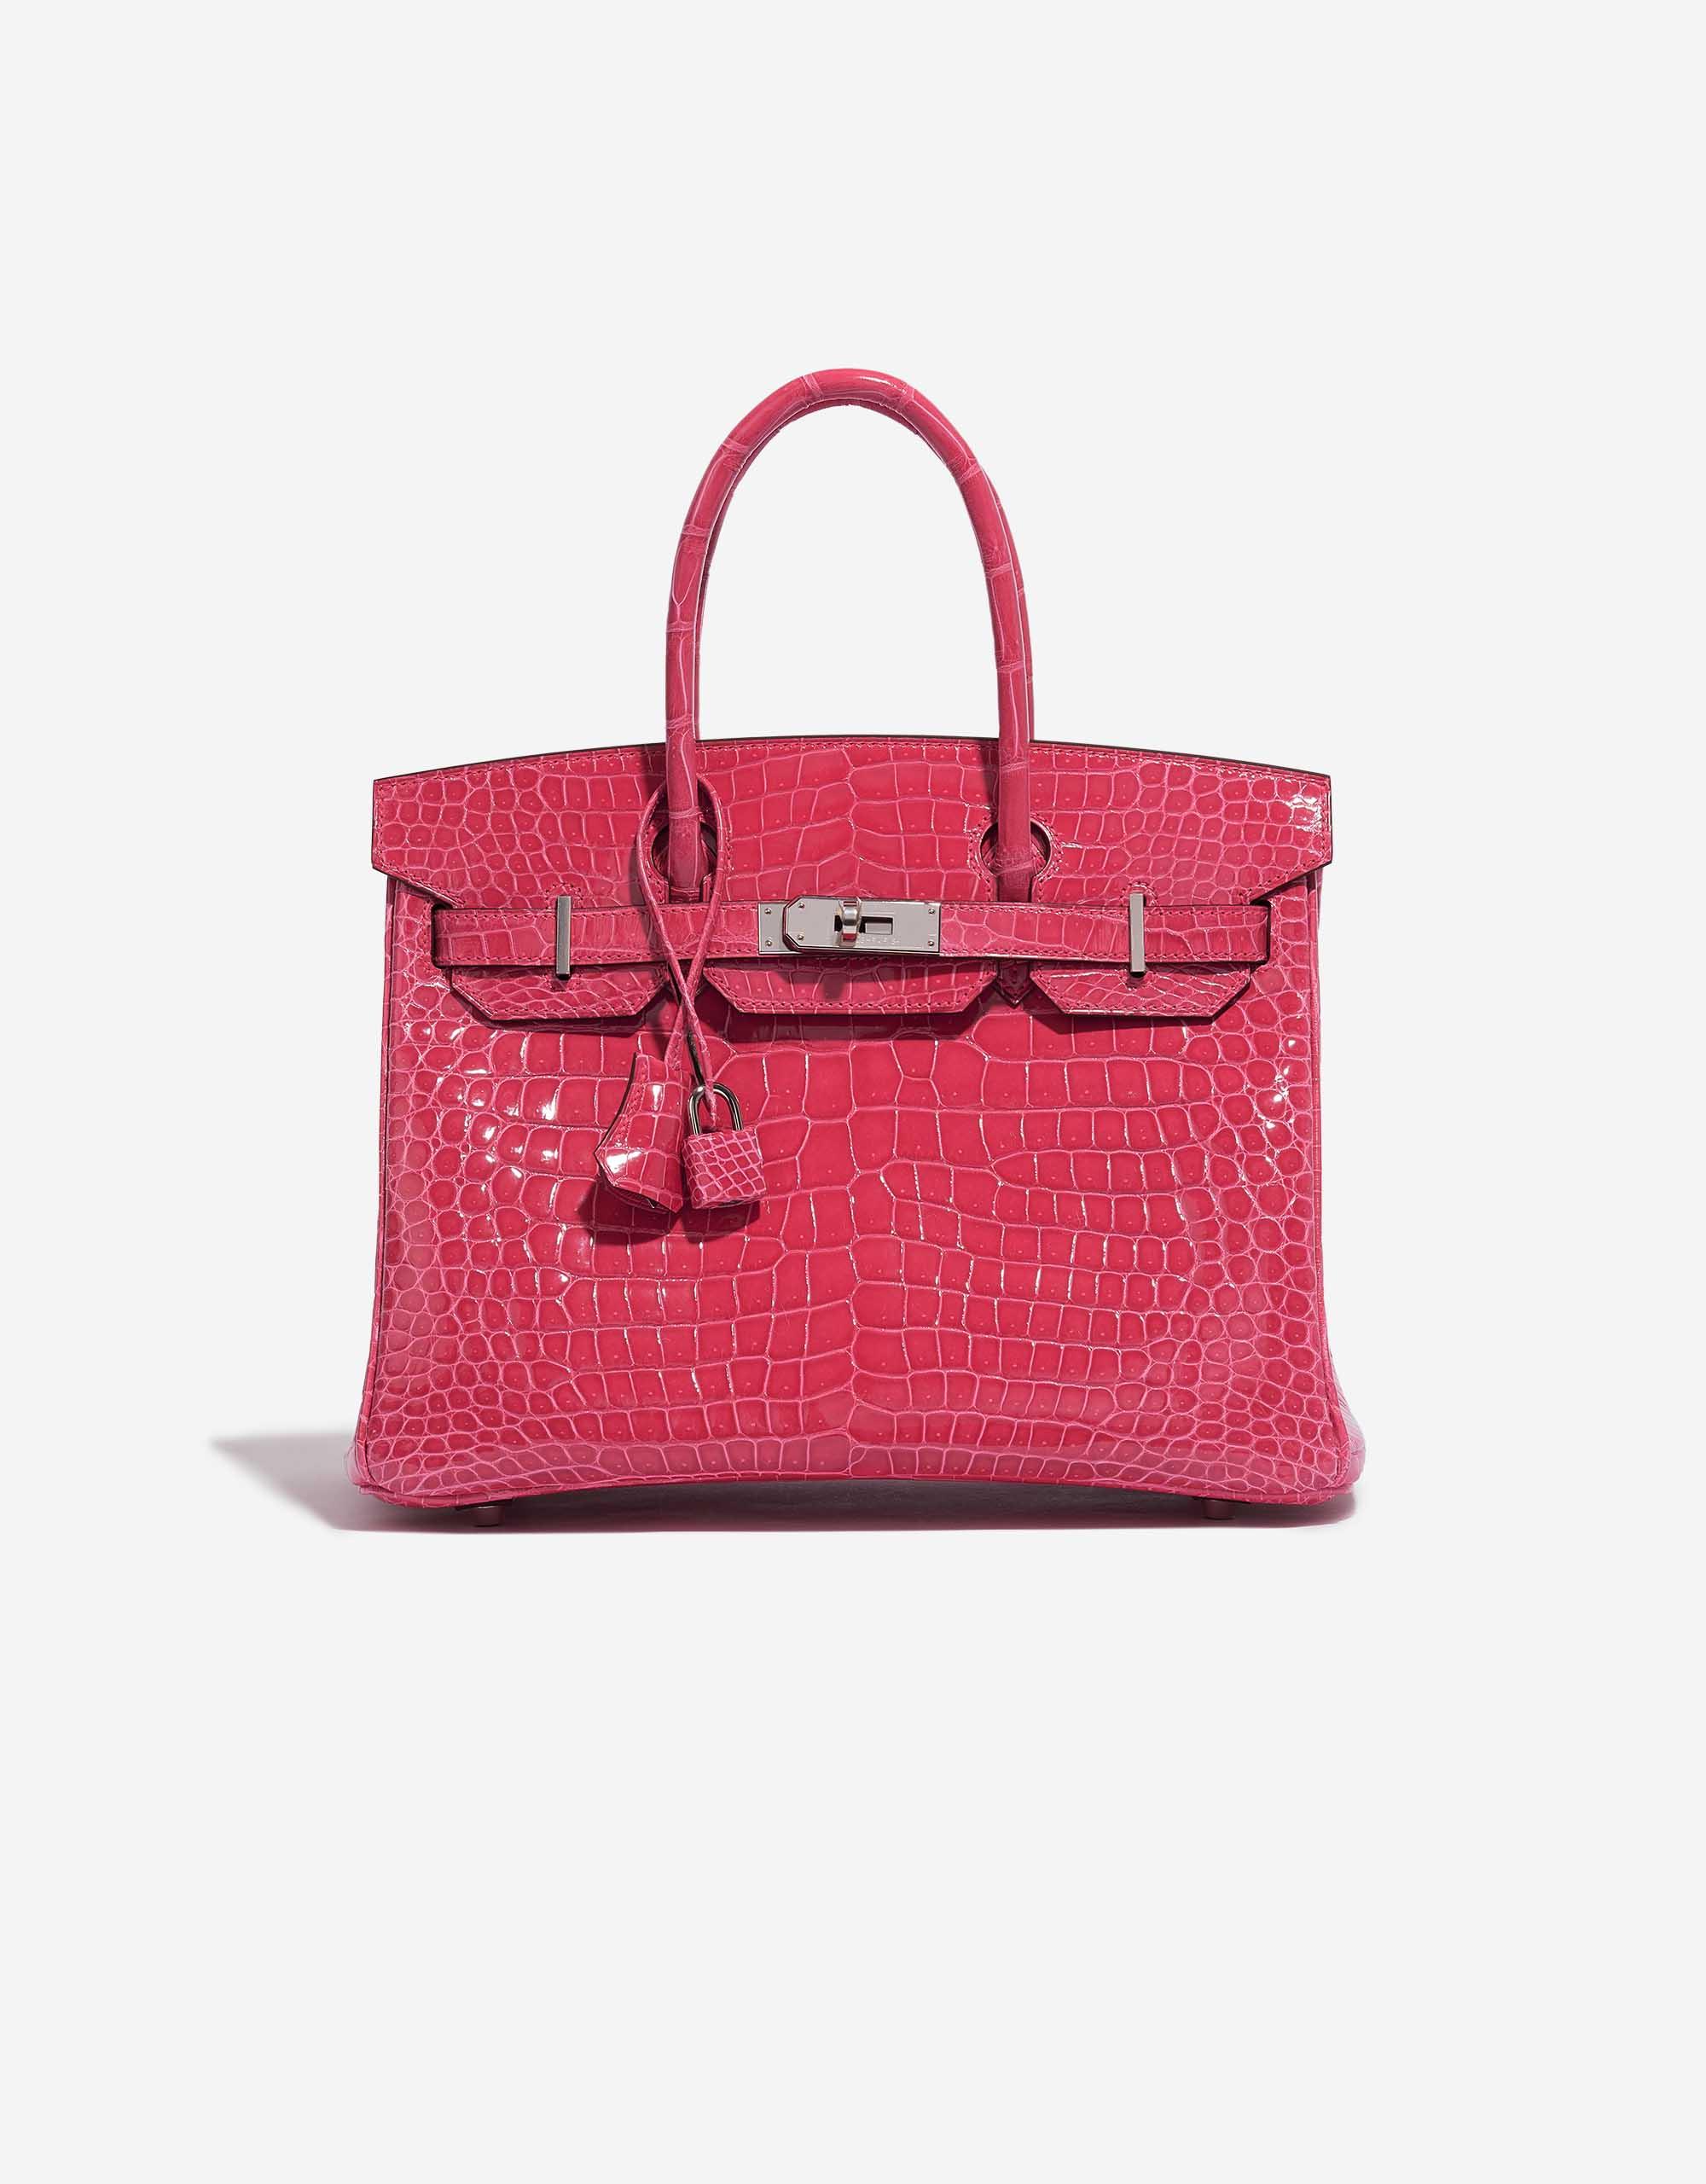 Hermès Birkin 30 Porosus Crocodile Rose Extreme | SACLÀB